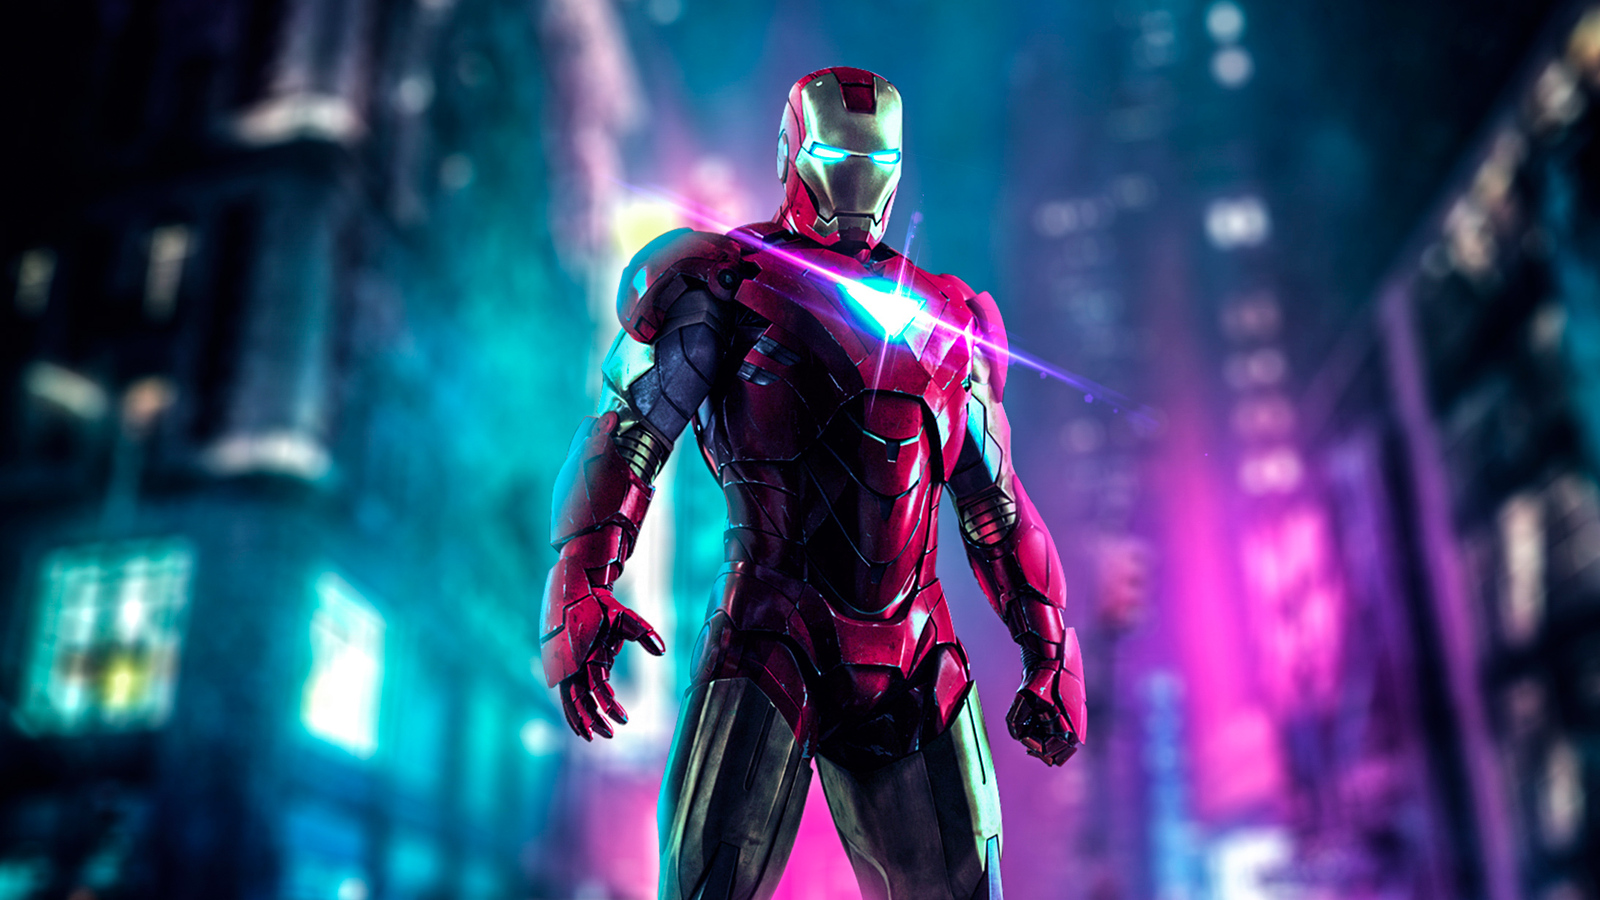 iron-man-neon-art-hg.jpg